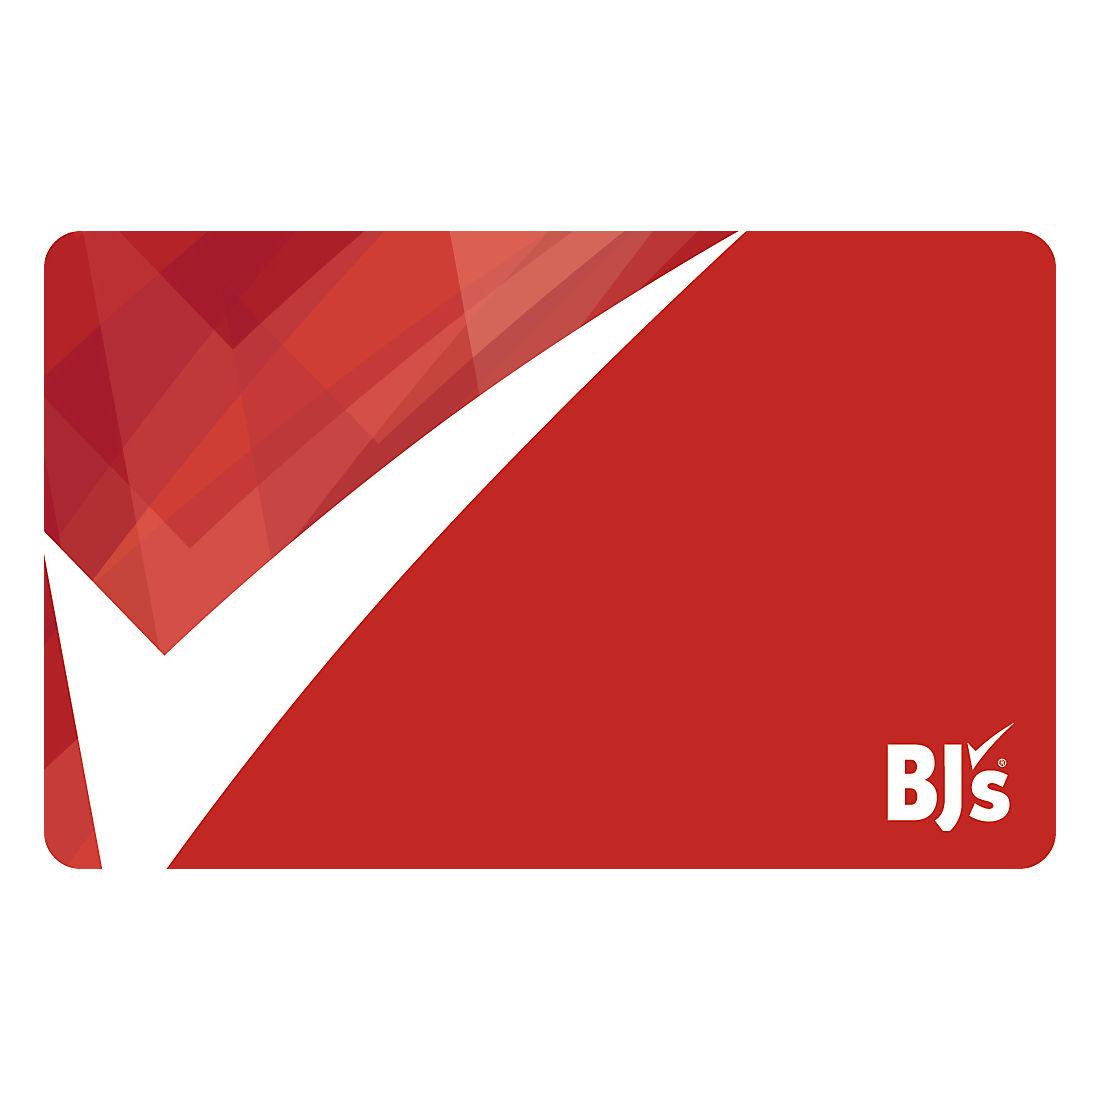 Bjs Credit Card Payment Address